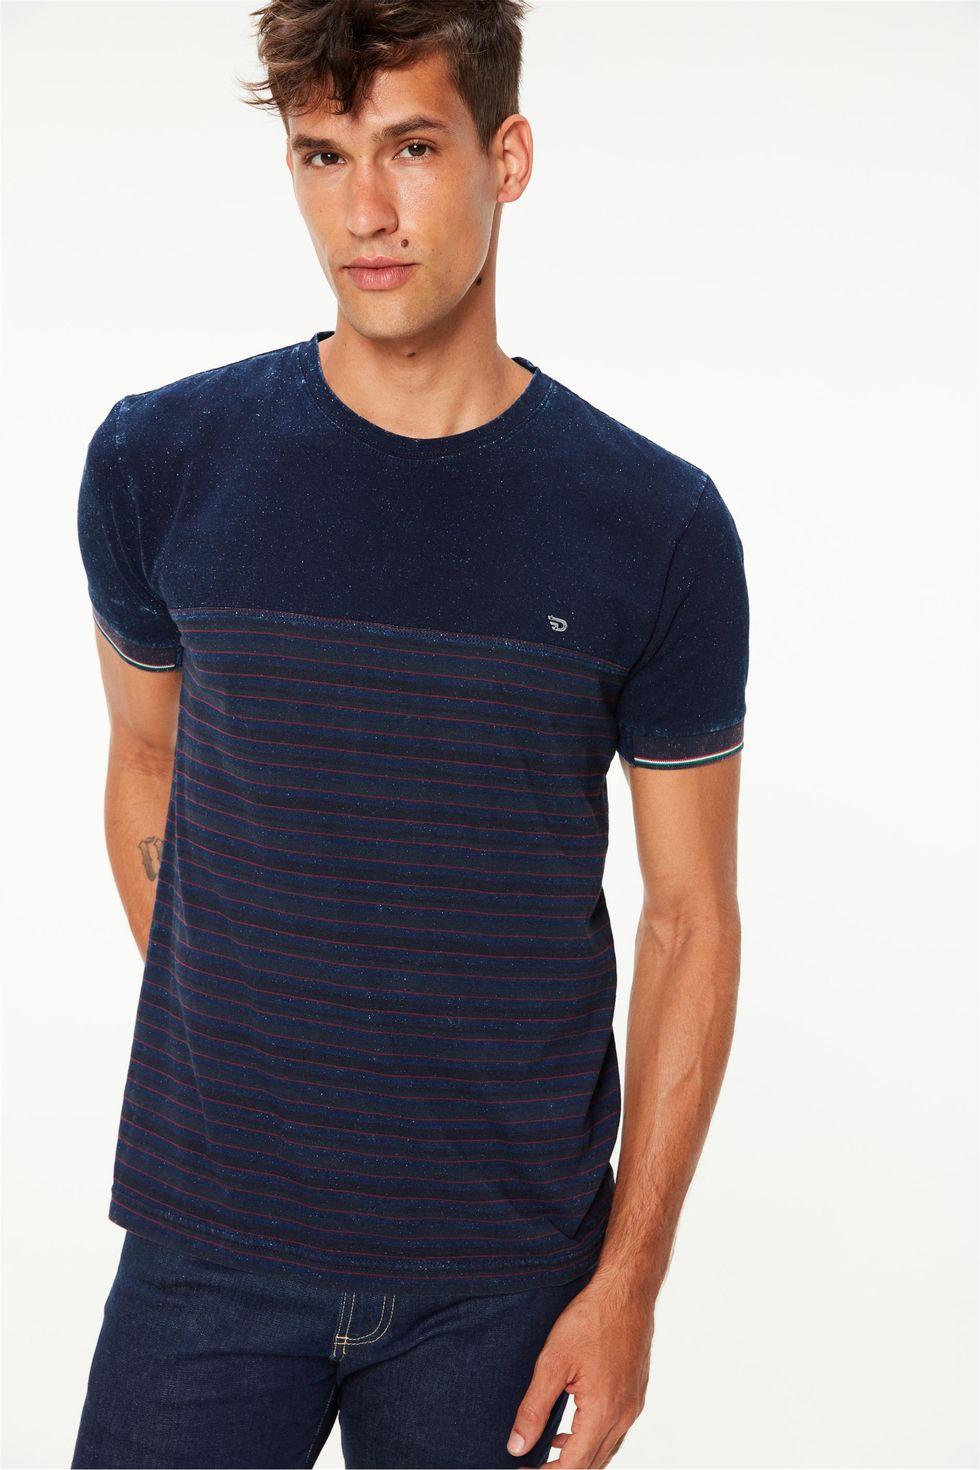 Camiseta-Malha-Denim-College-Masculina-Frente--